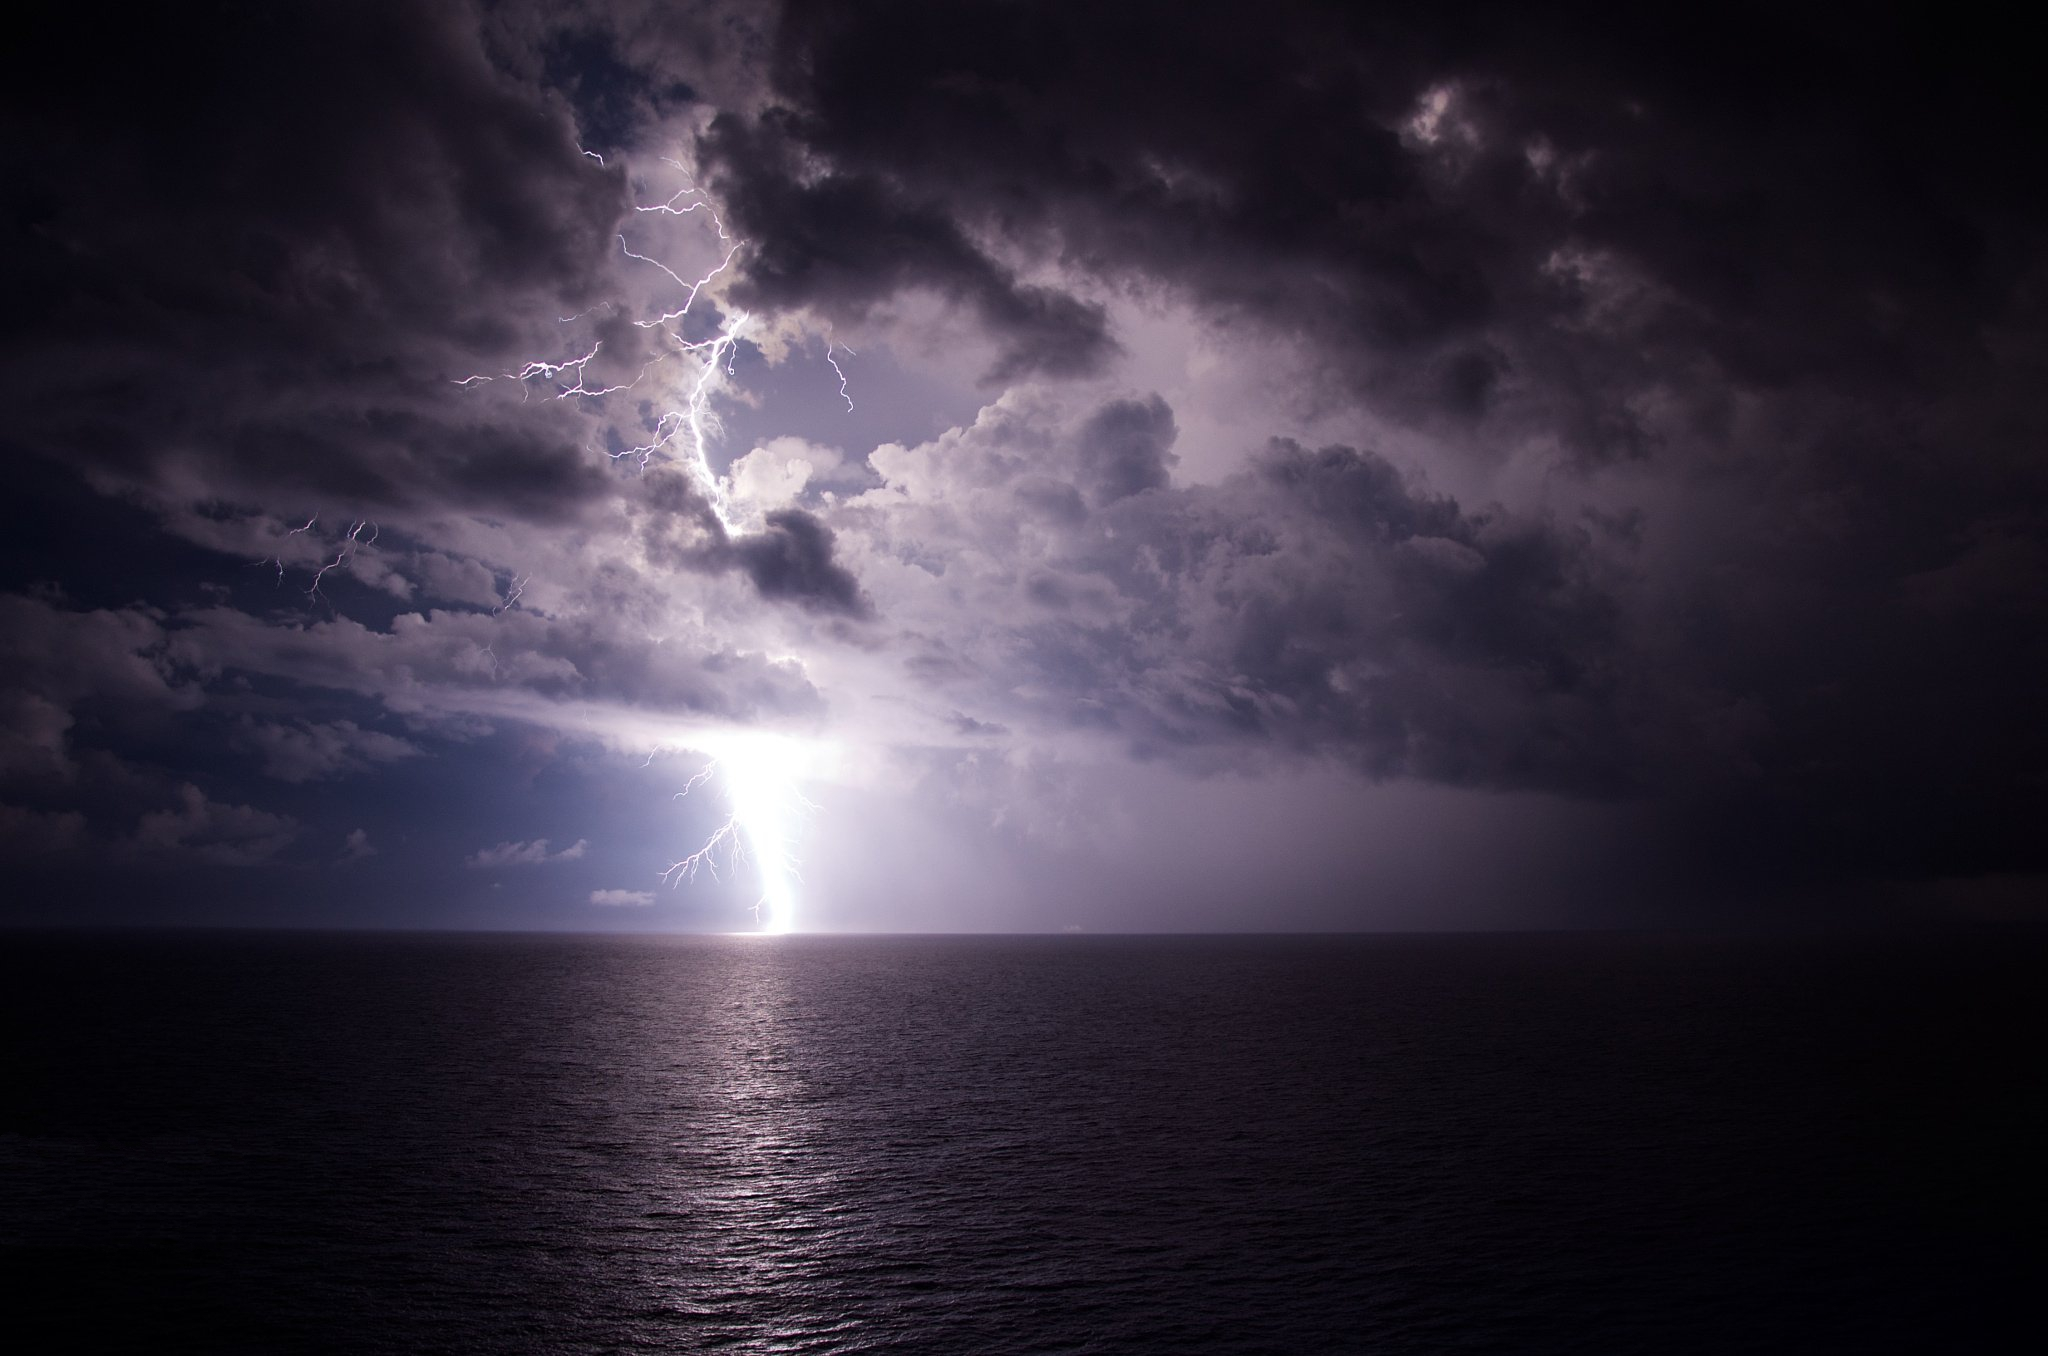 Lightning Storm Wallpapers For Desktop